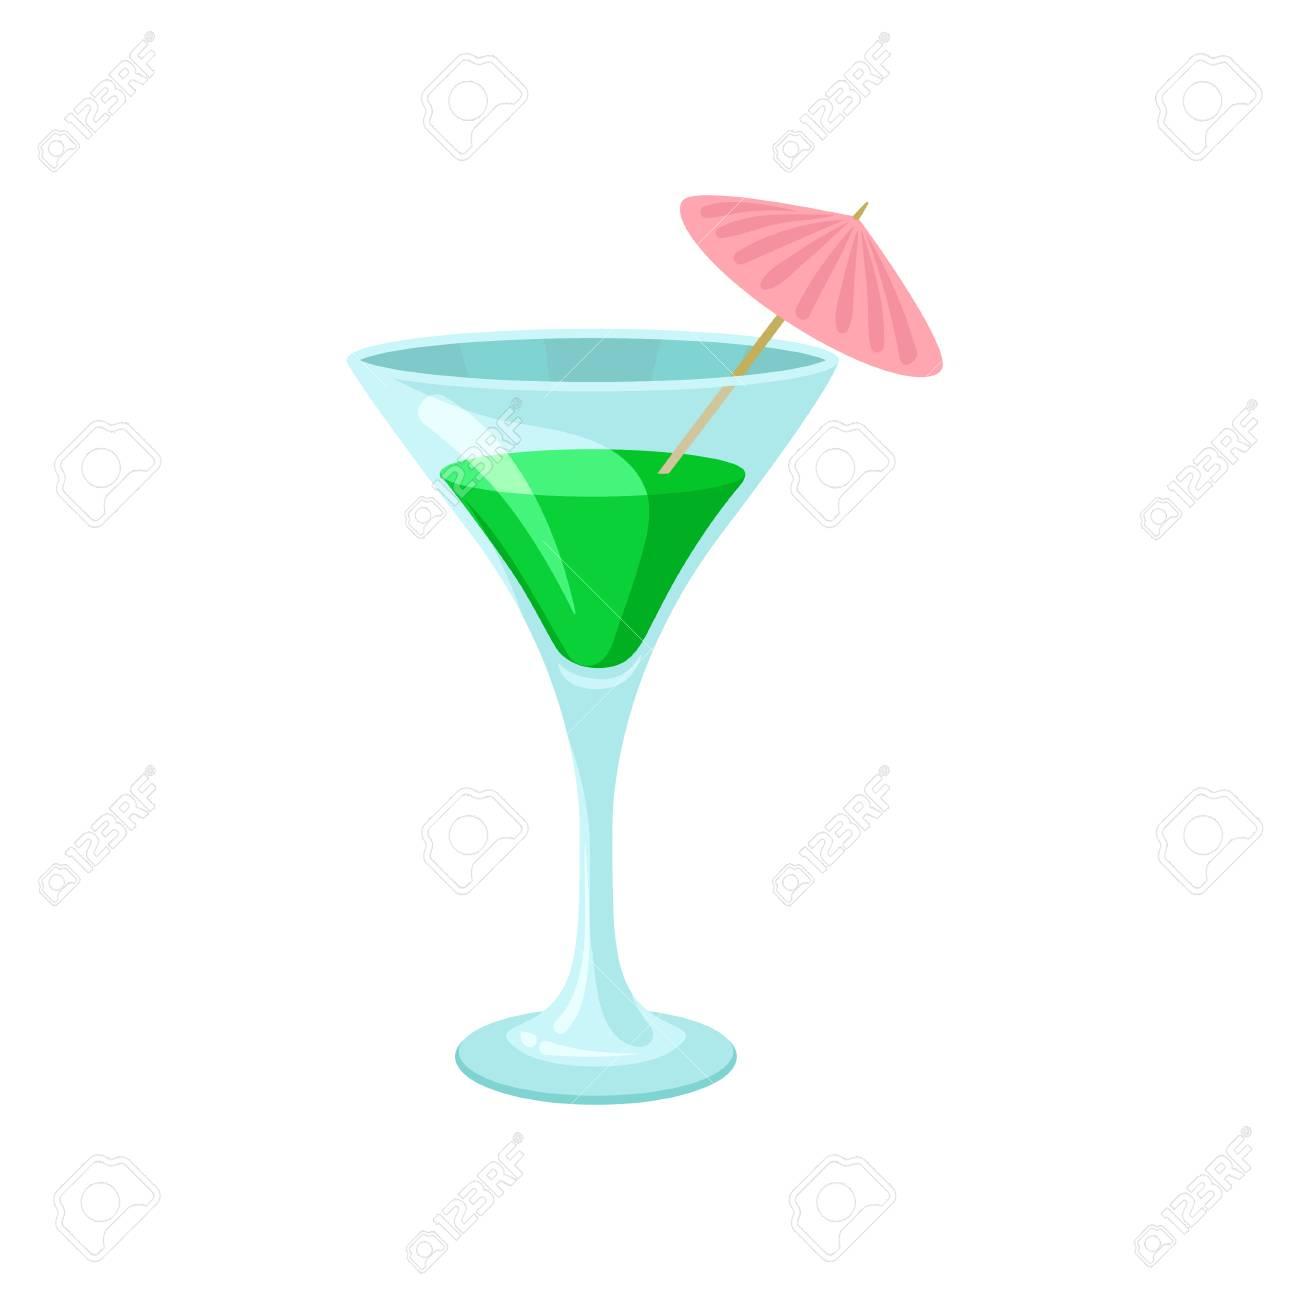 Creen Cocktail With Umbrella In Martini Glass Cartoon Vector